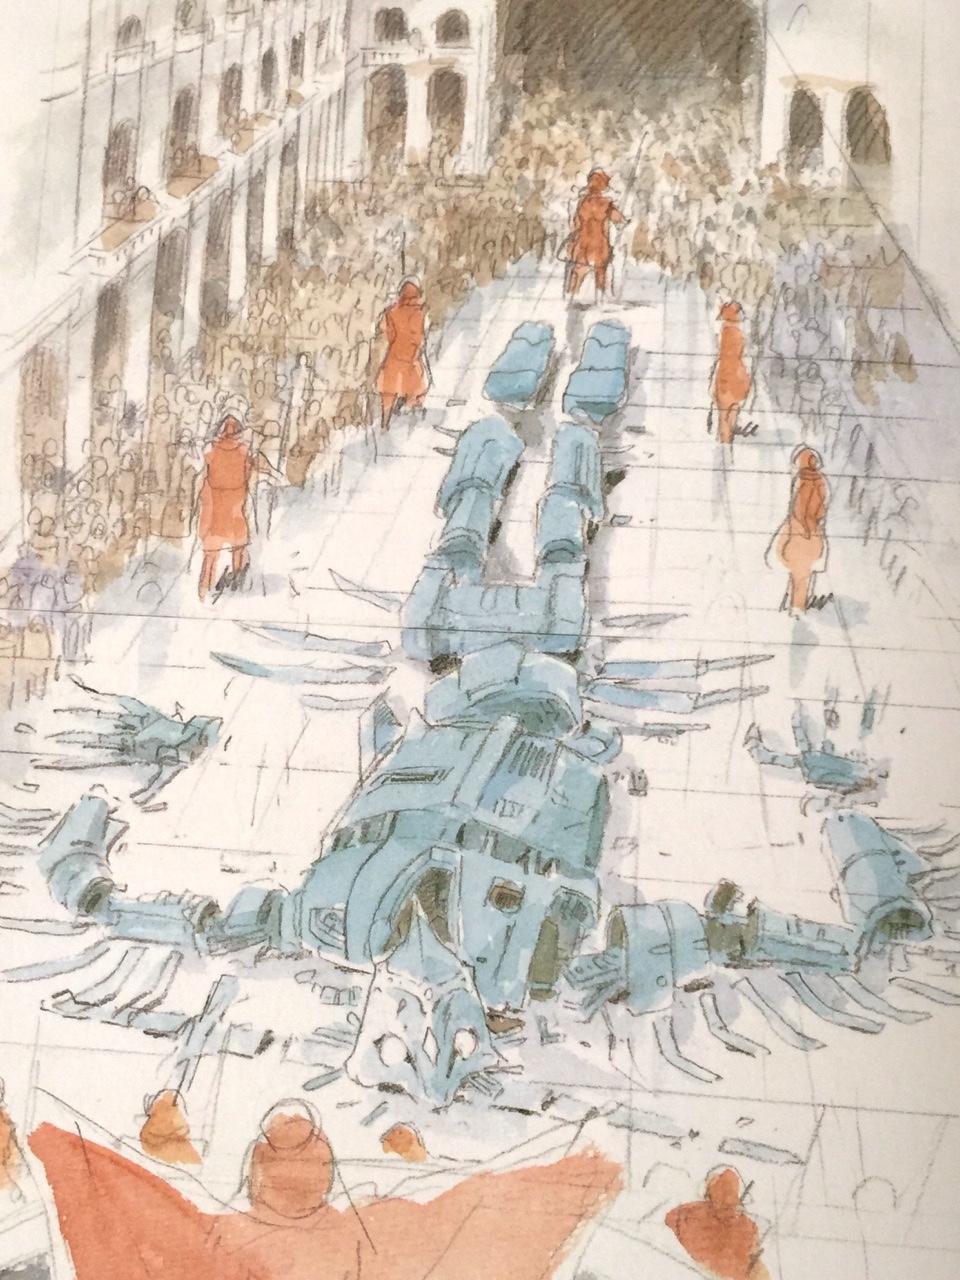 Hayao-Miyazaki-The-Art-of-Nausica-Of-The-Valley-Of-The-Wind-Watercolor-Impressions-nausicaa-of-the-valley-of-the-wind-39115019-960-1280.jpg